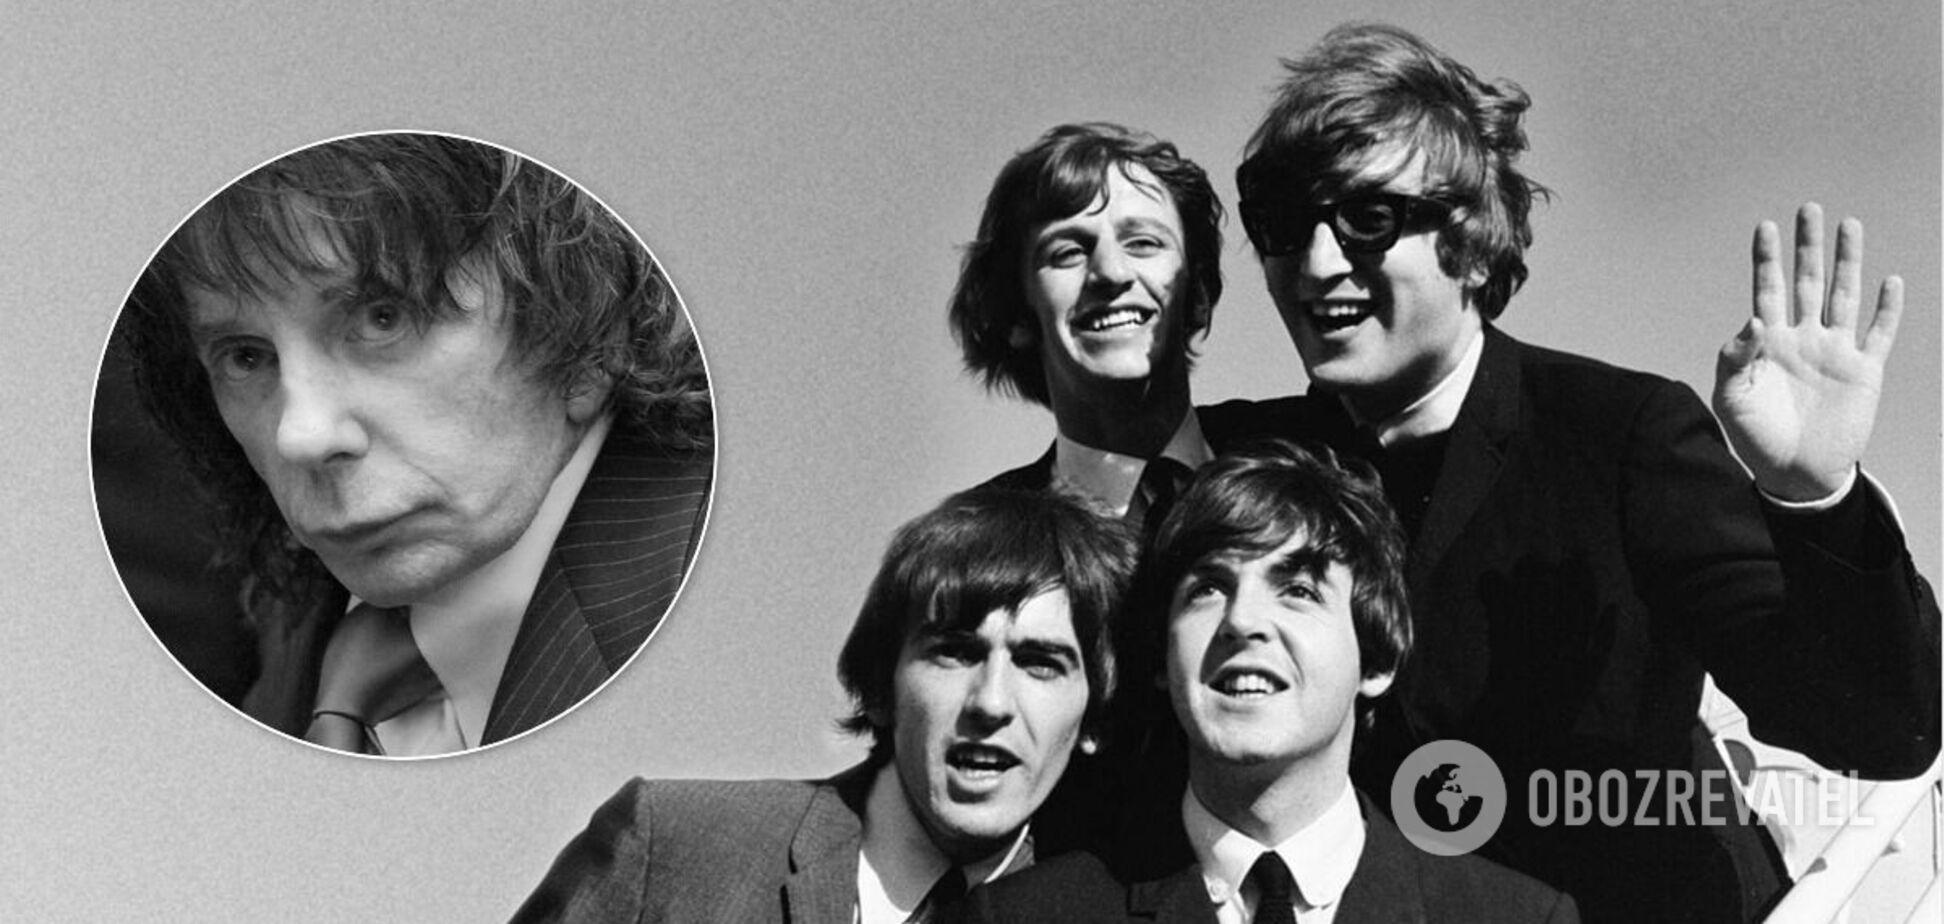 Помер продюсер The Beatles, засуджений за вбивство актриси